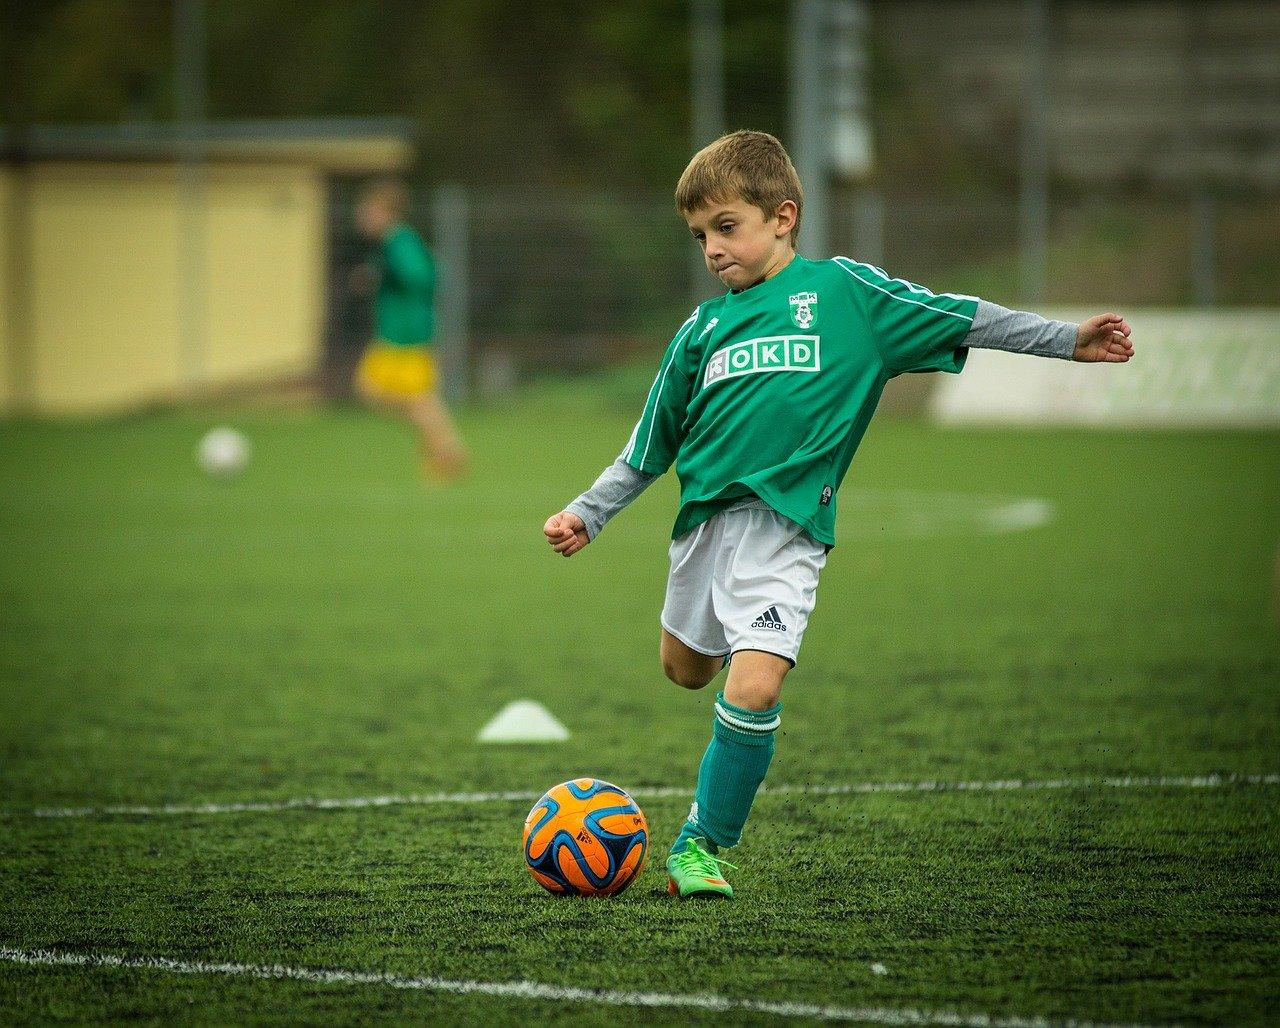 deporte ley infancia